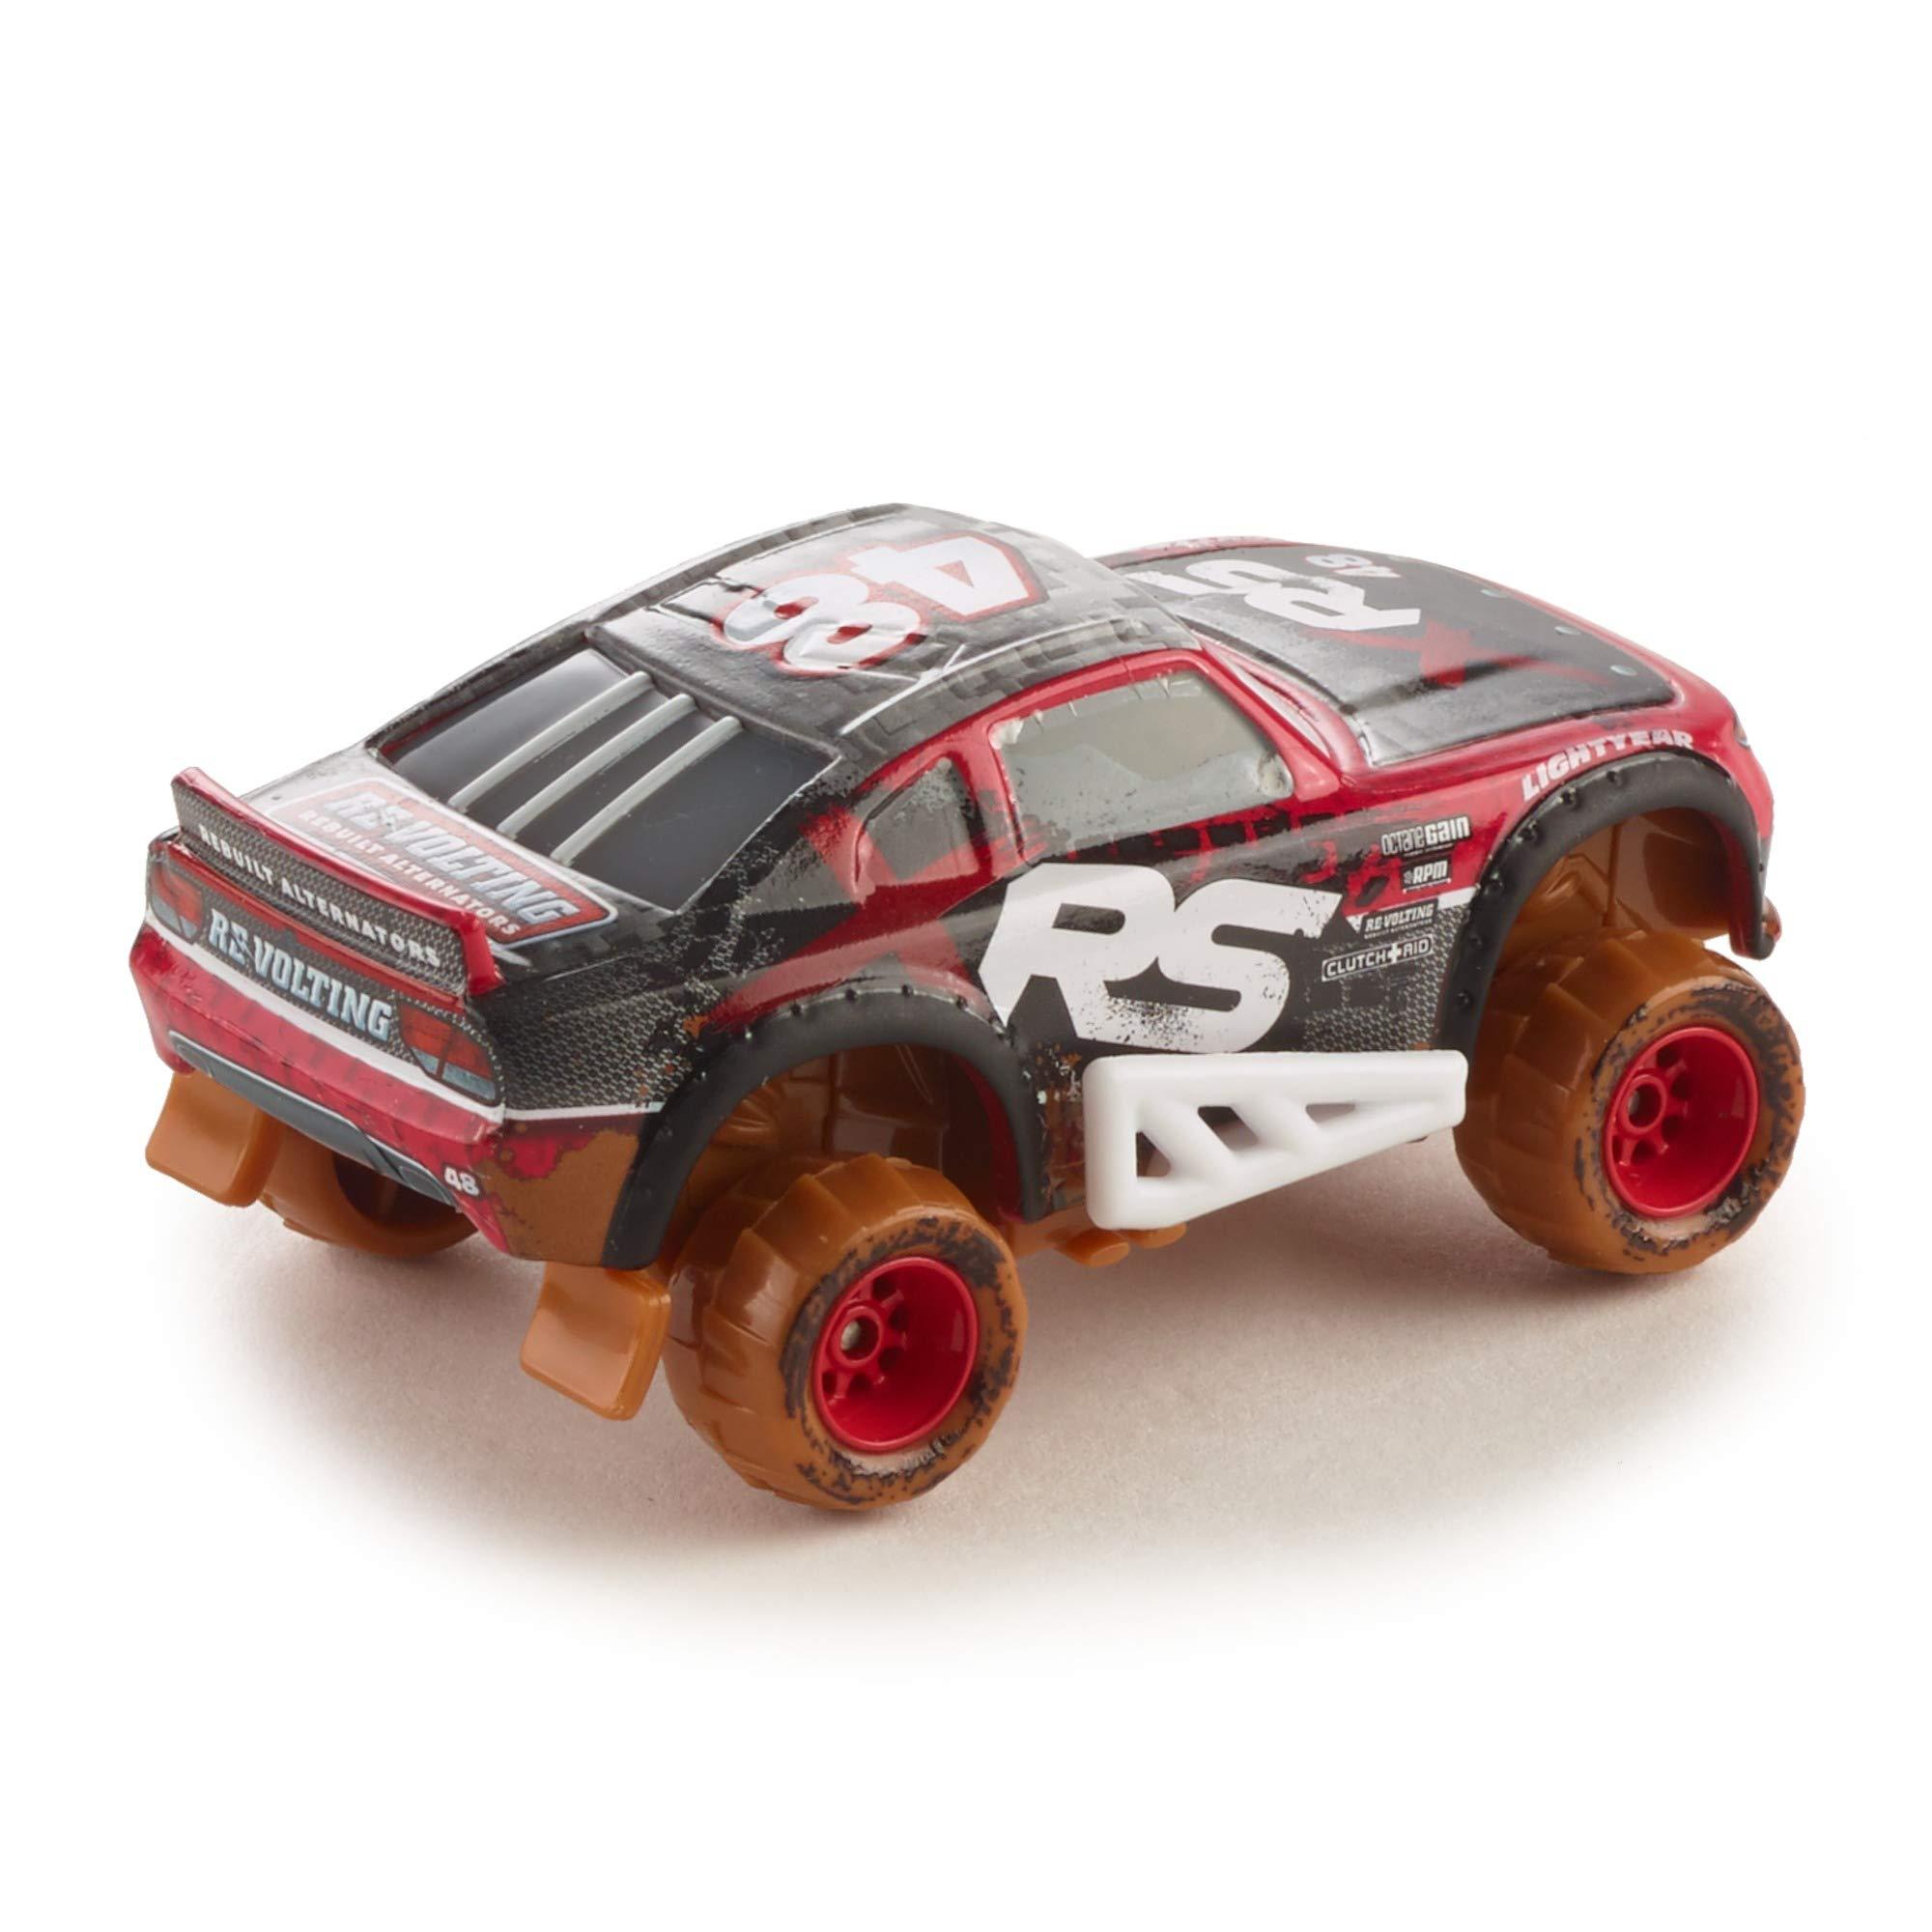 Disney/Pixar Cars XRS Mud Racing Revolting